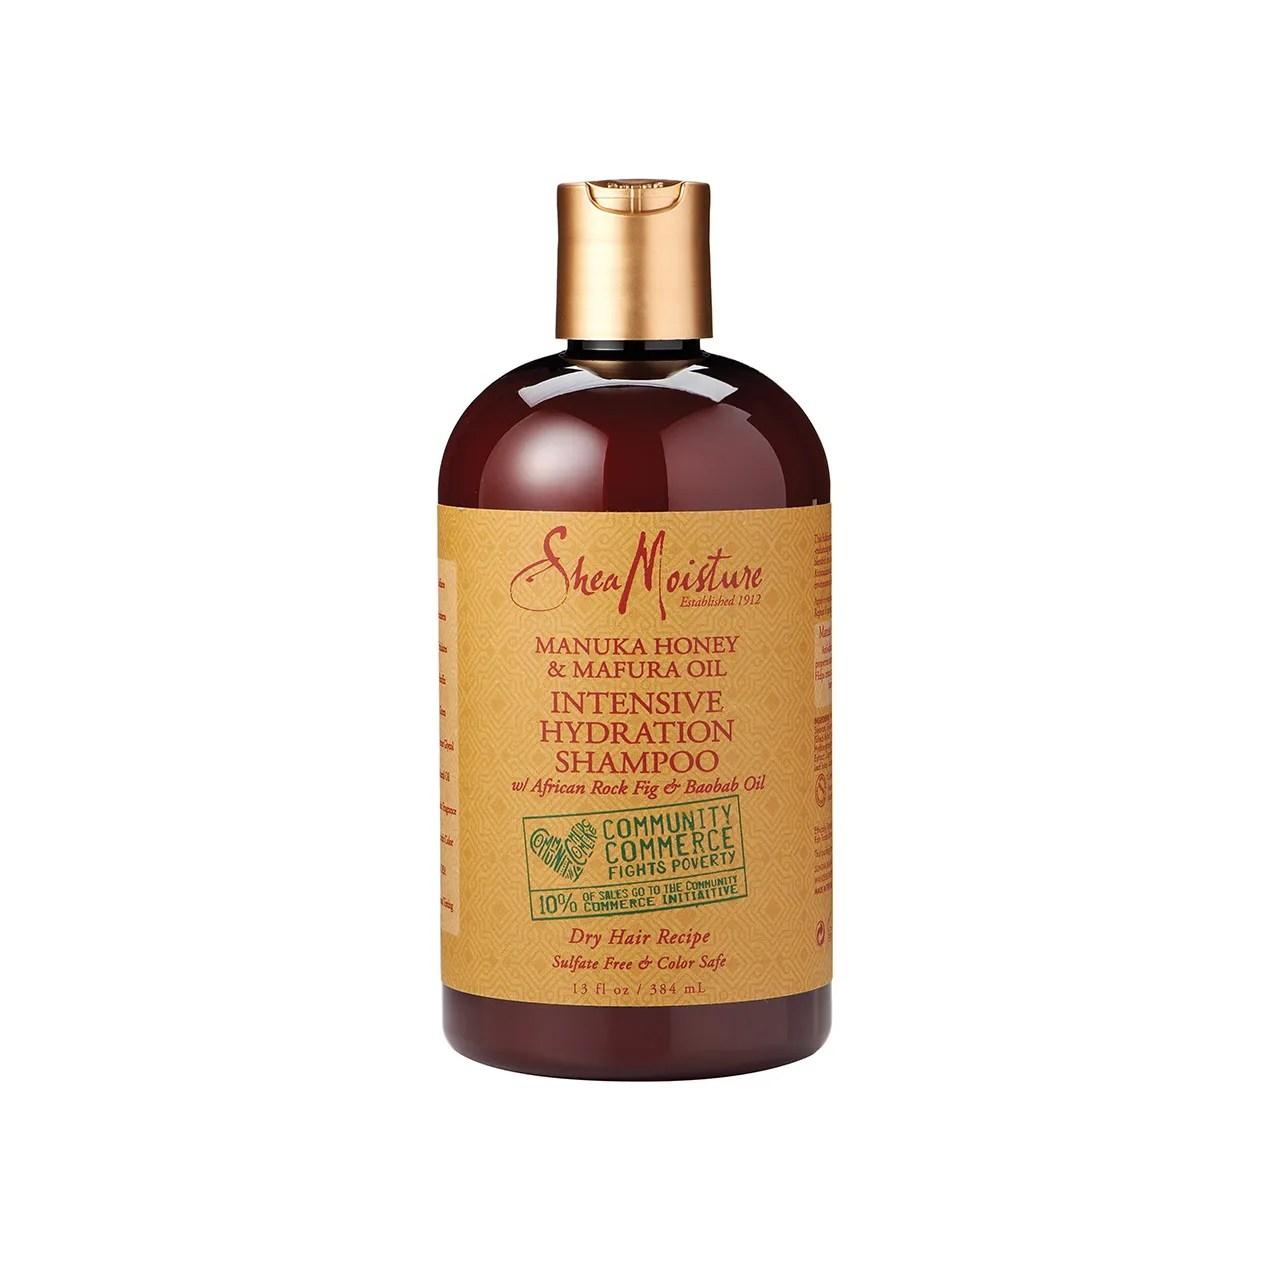 SheaMoisture Manuka Honey Amp Mafura Oil Intensive Hydration